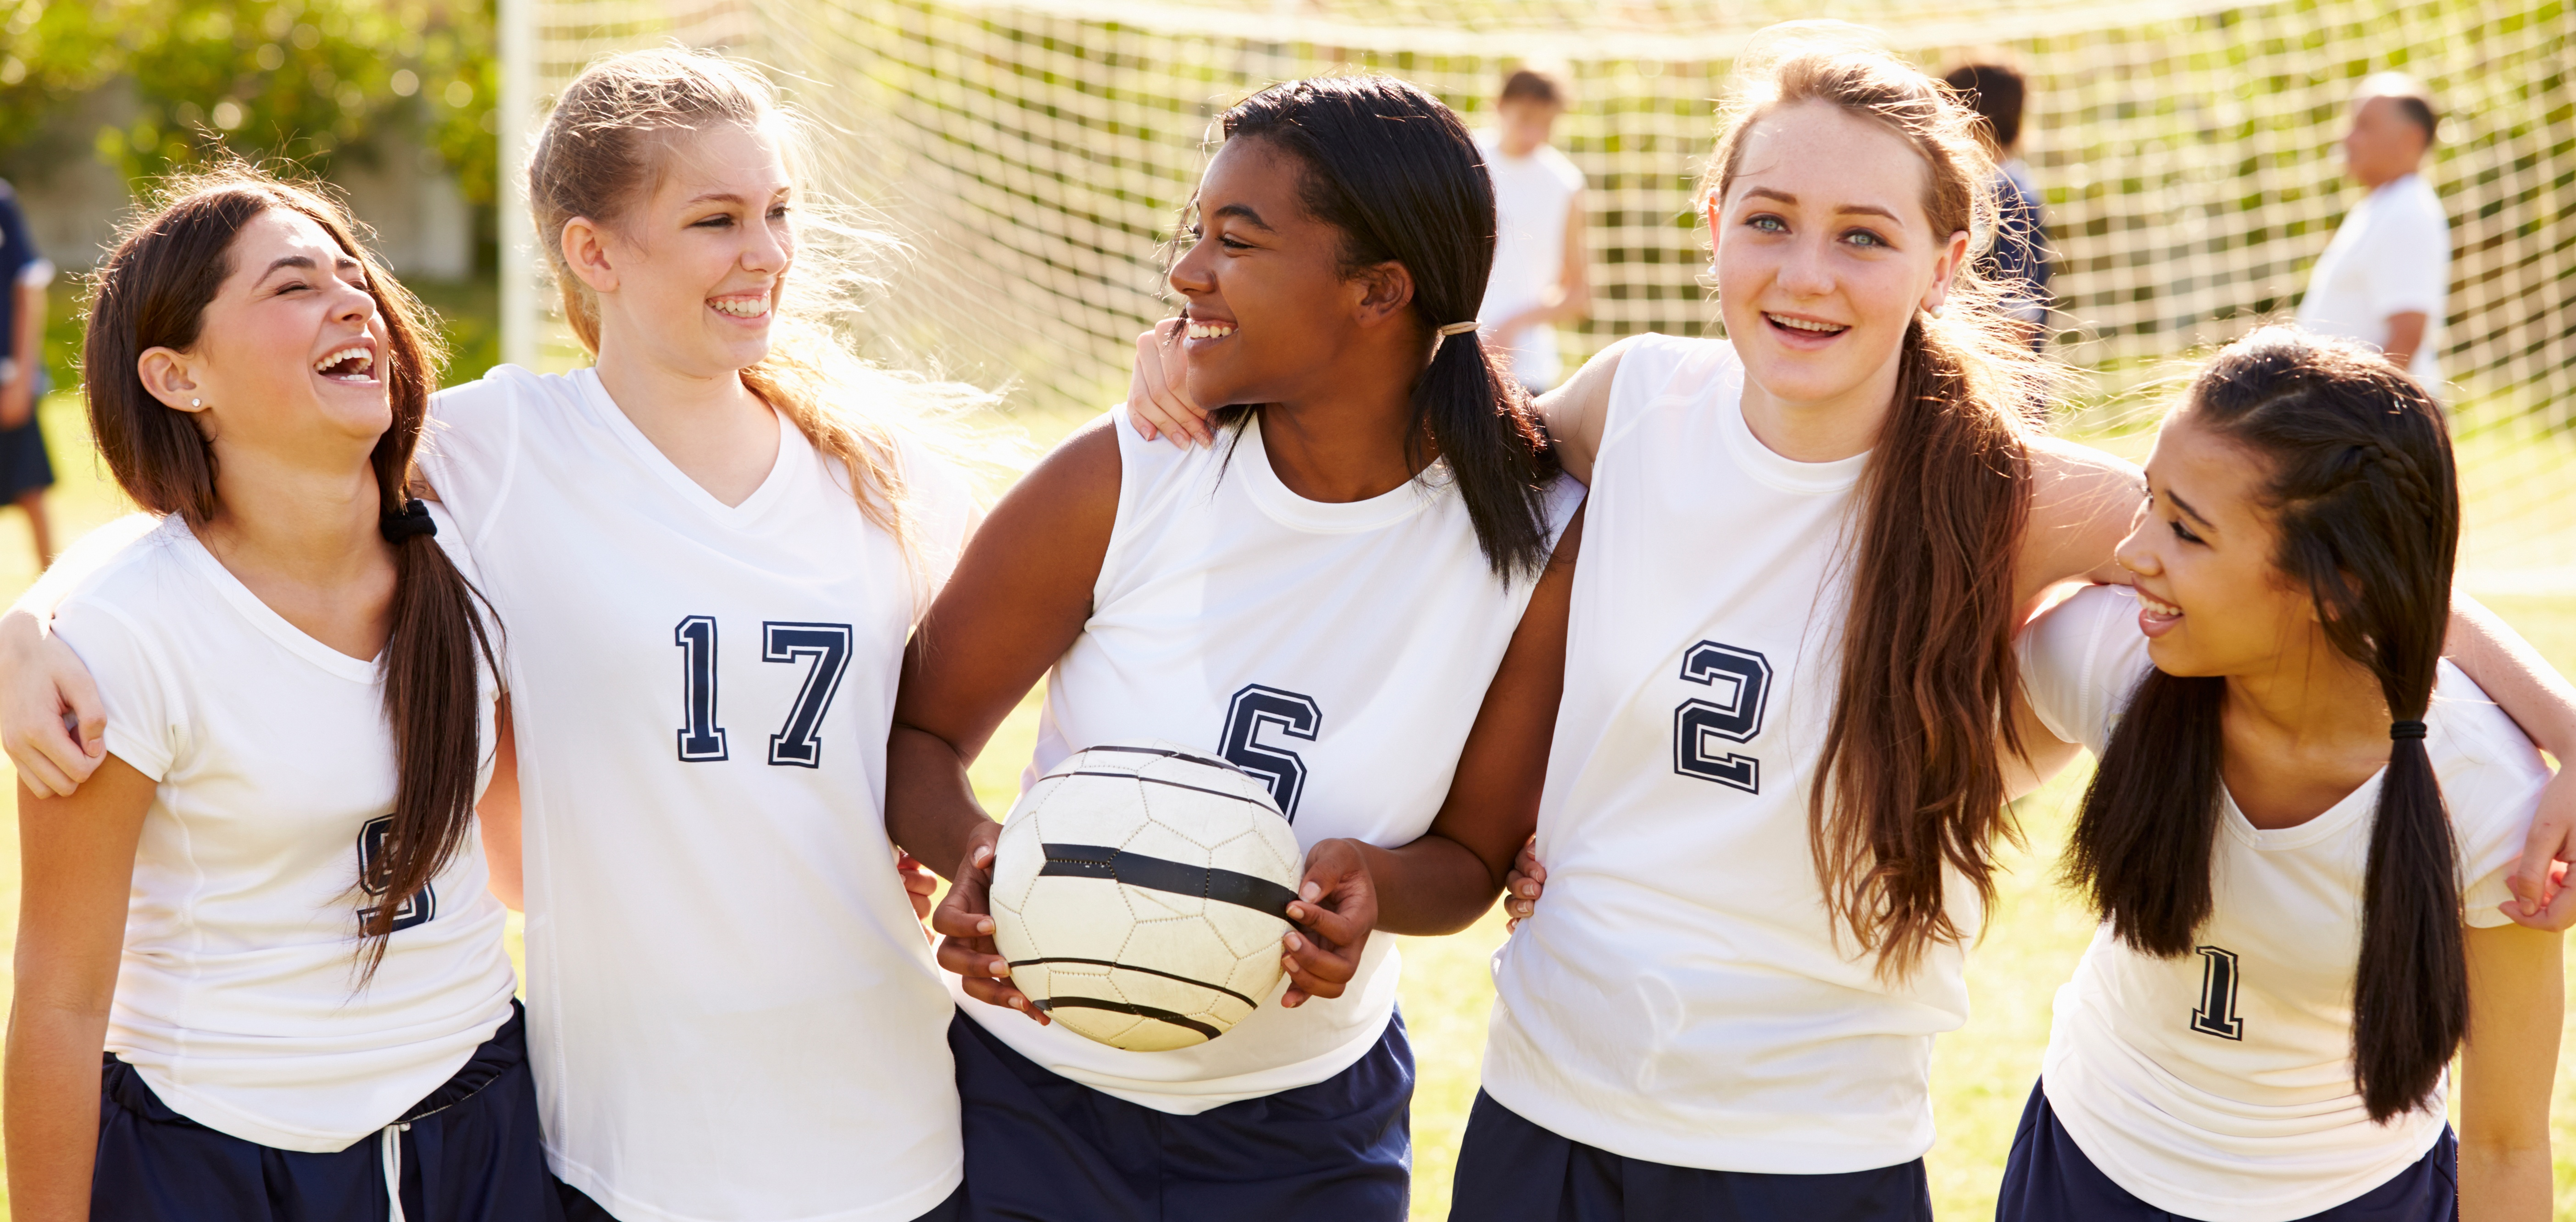 High_school_girls_playing_soccer